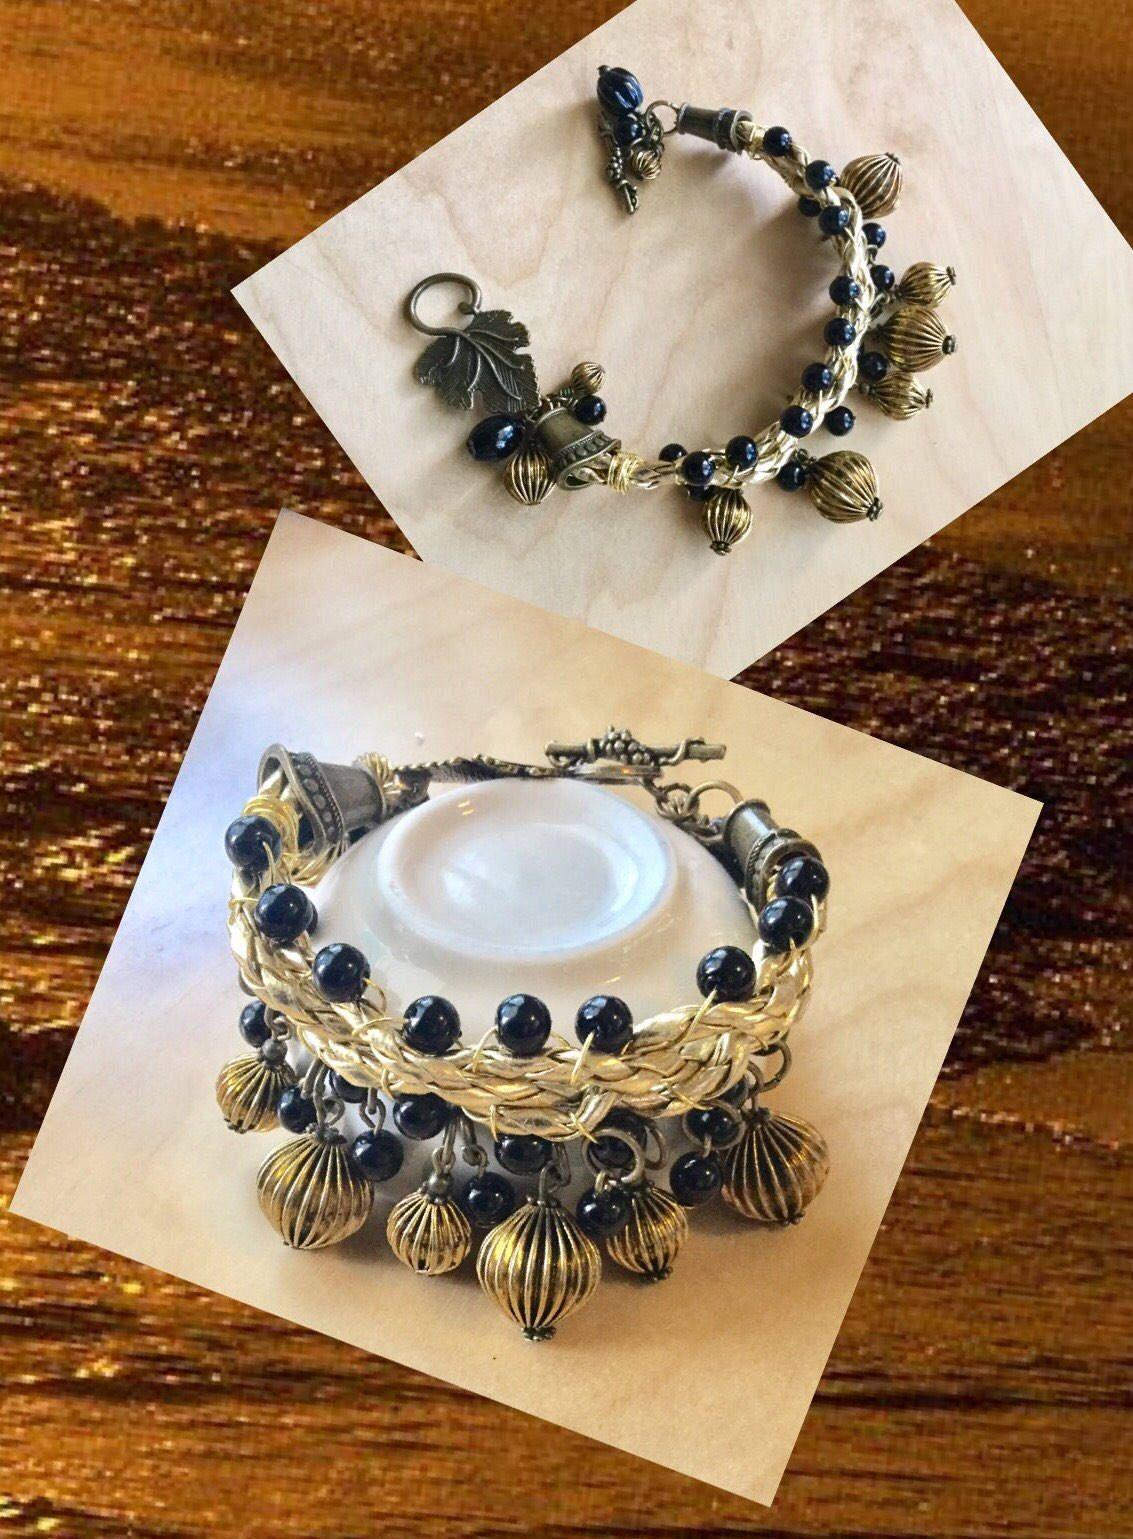 Trendy gold leather boho handwoven bracelet handmade gift for her trendy gold leather boho handwoven bracelet handmade gift for her birthday gift friendship gift girlfriend gift solutioingenieria Choice Image